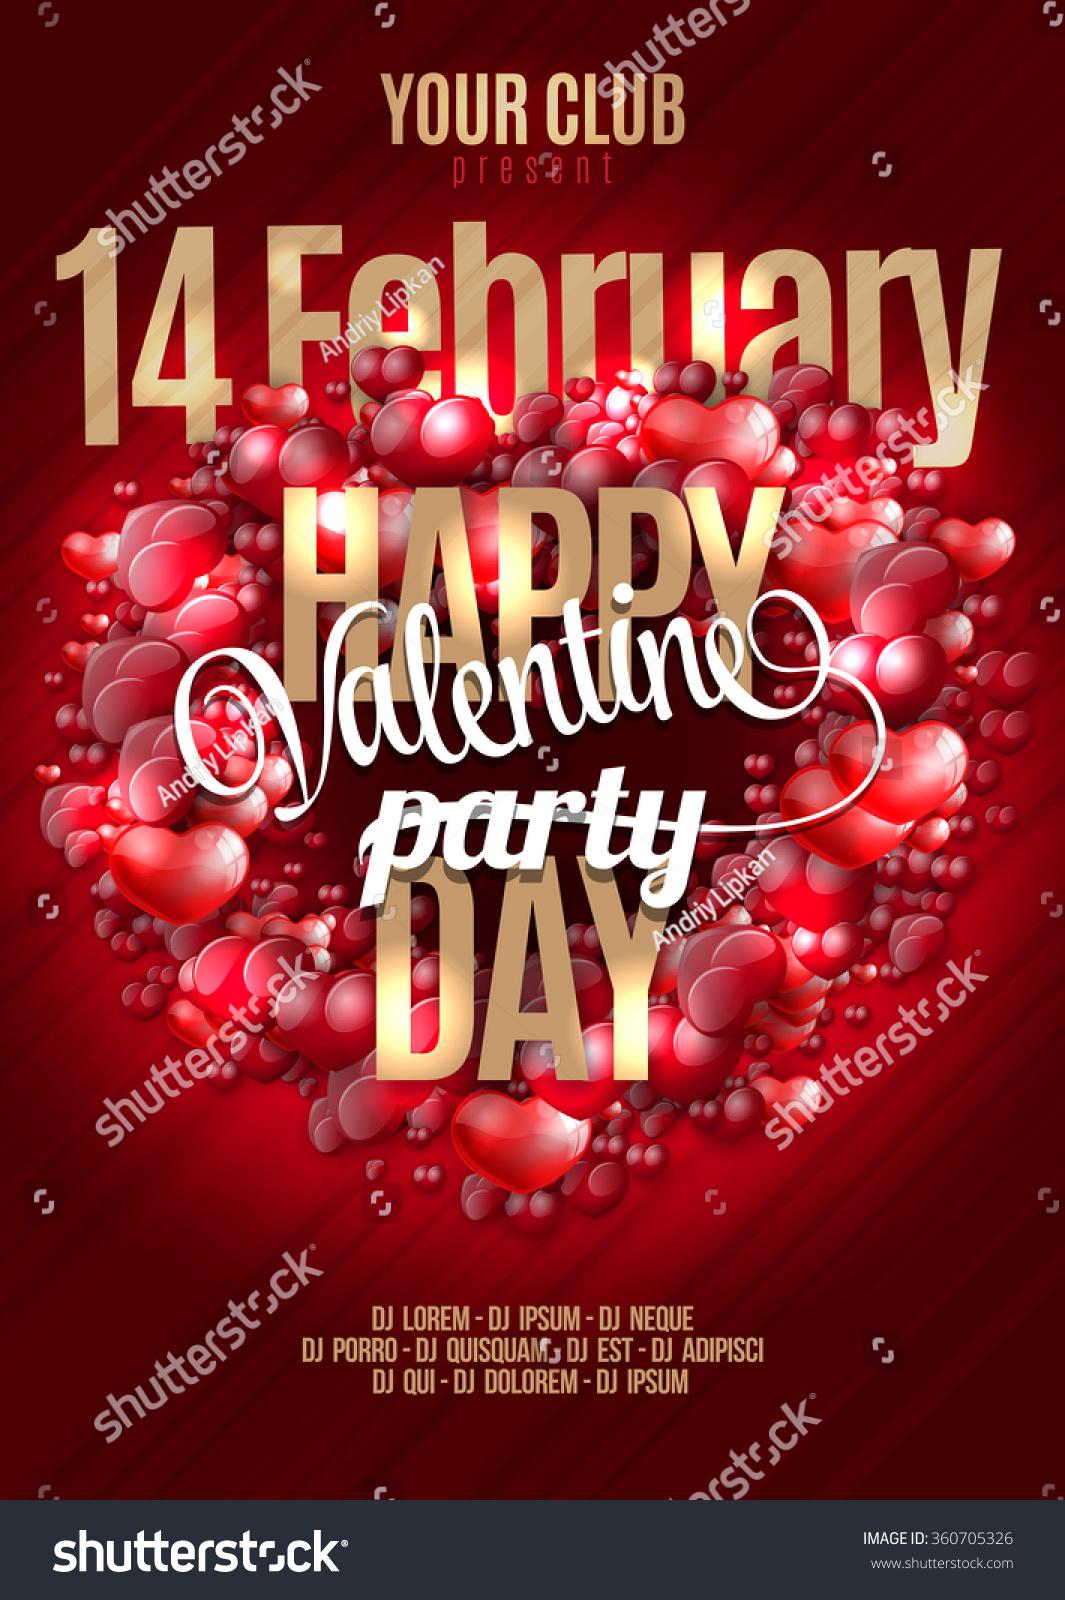 Valentines Happy Day Party Invitation Flyer Stock Vector 360705326 ...